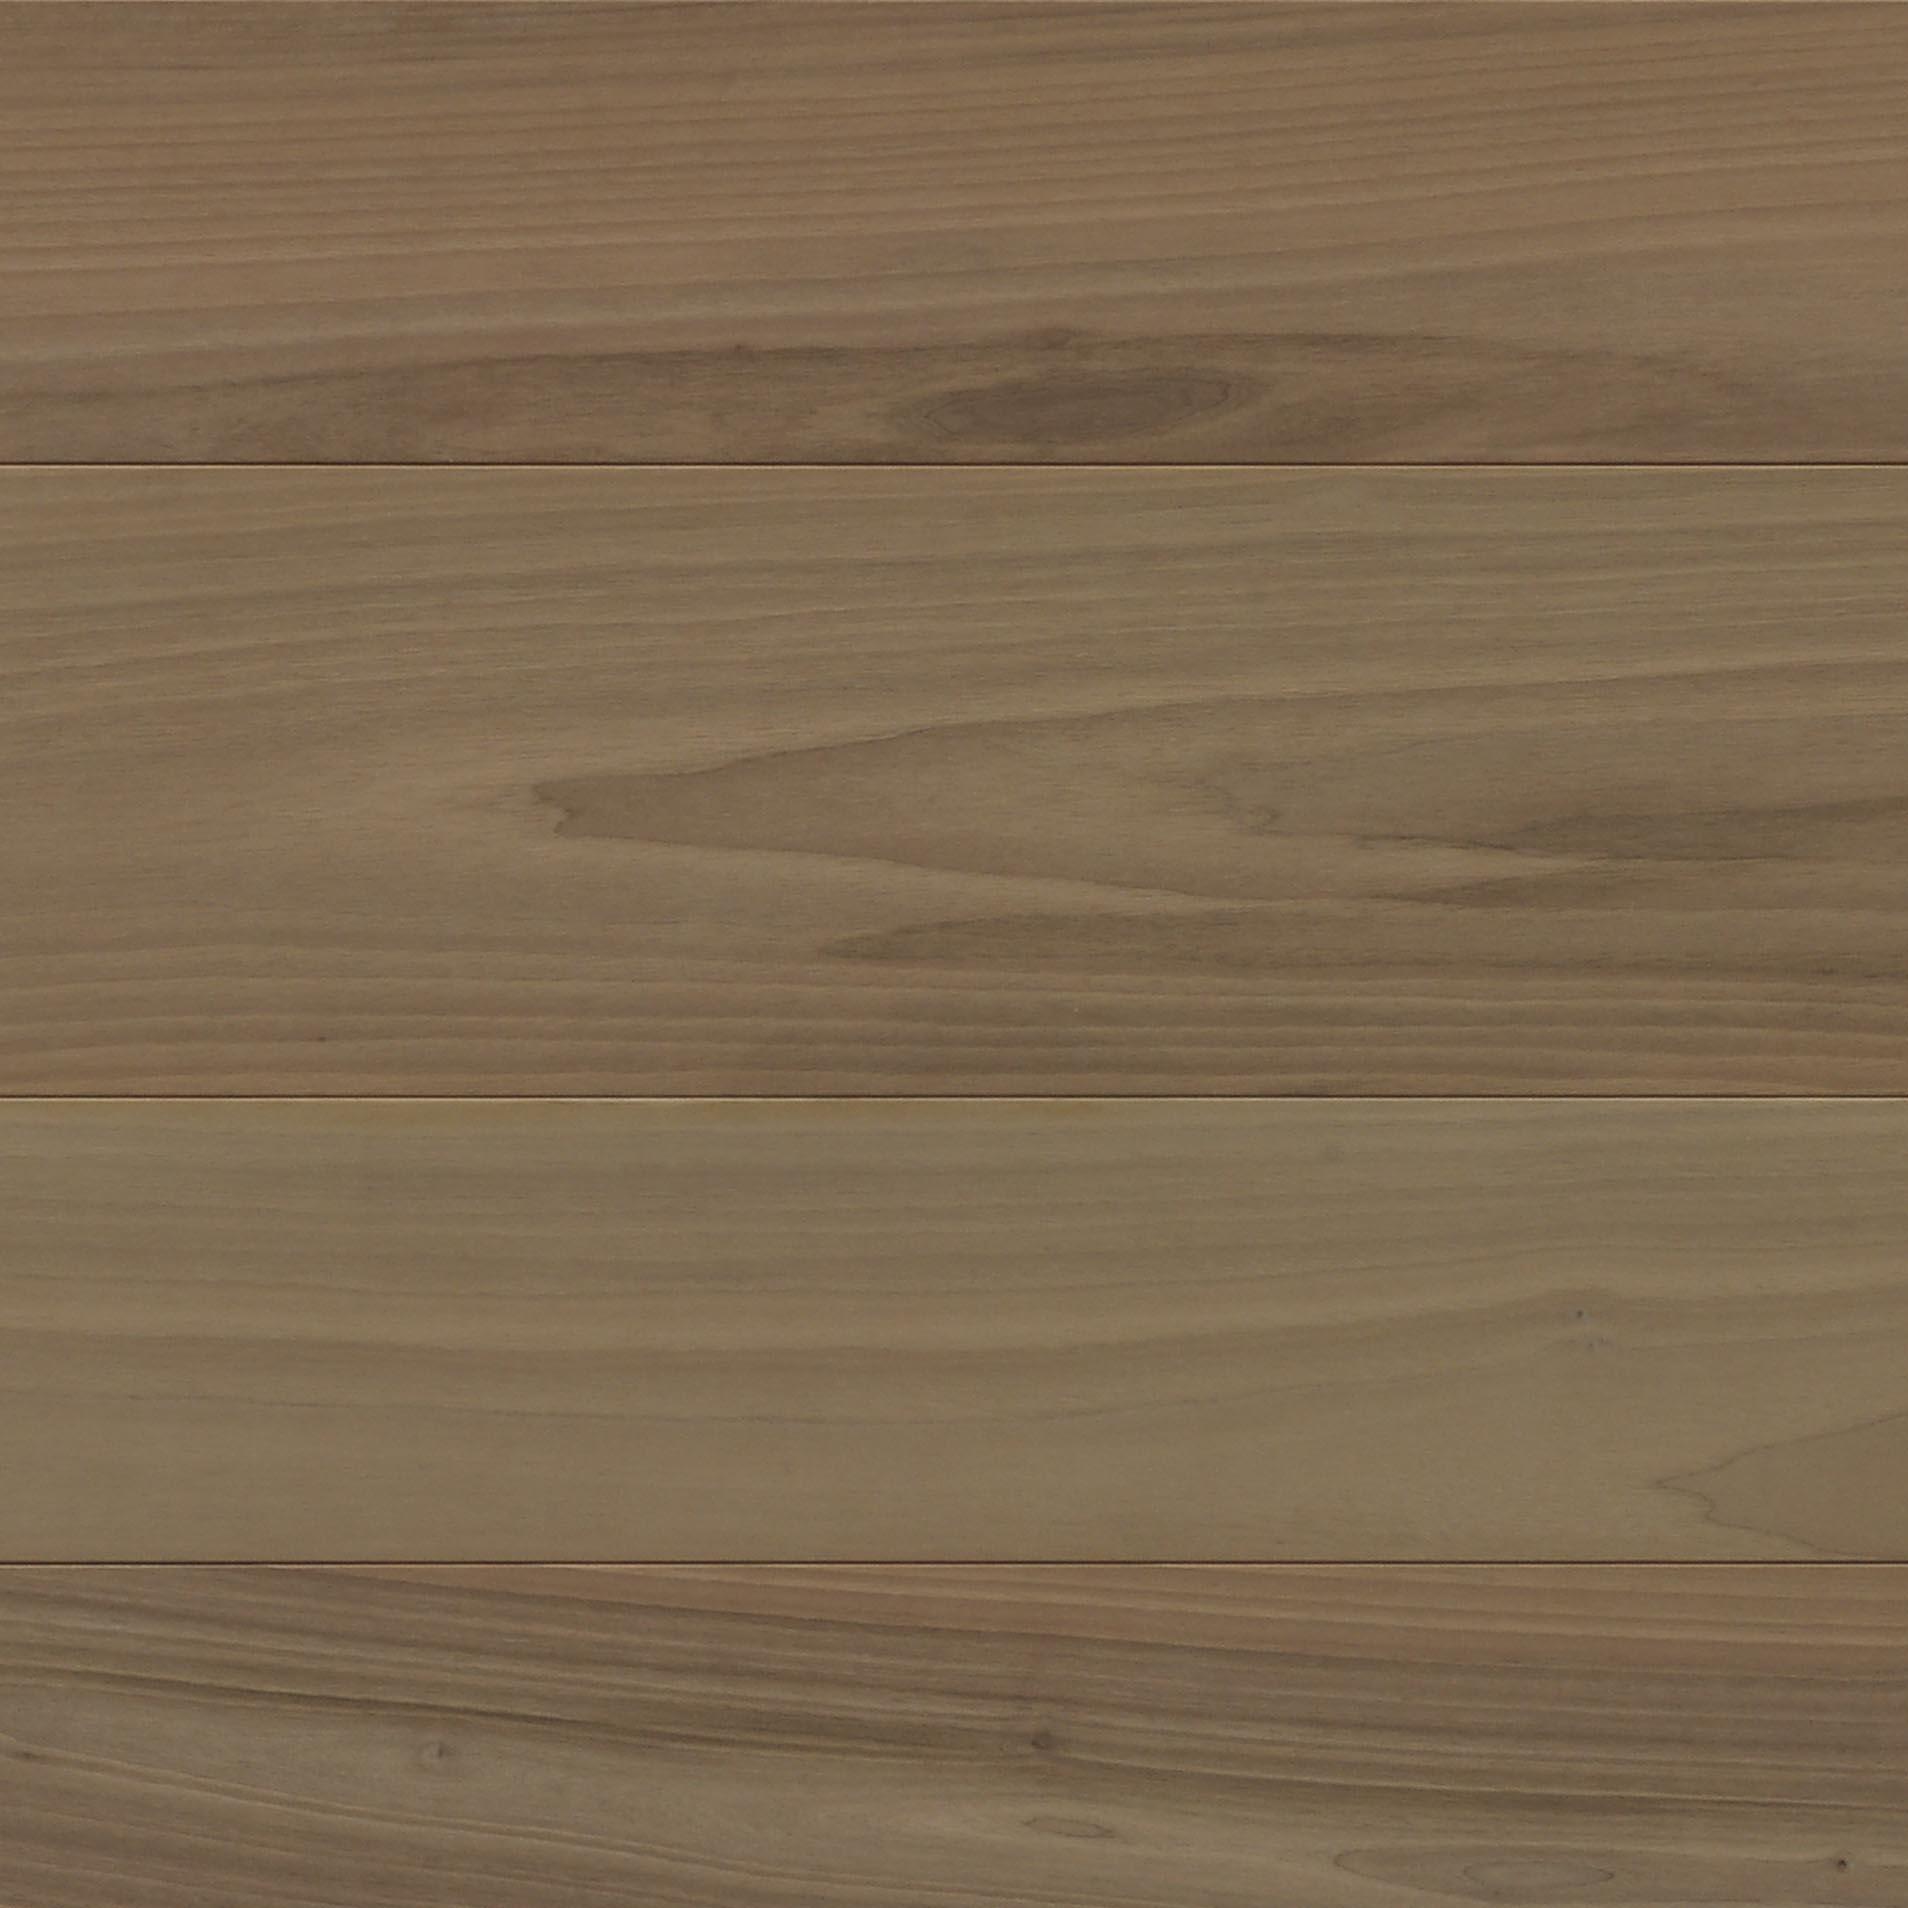 pavimento legni scuri